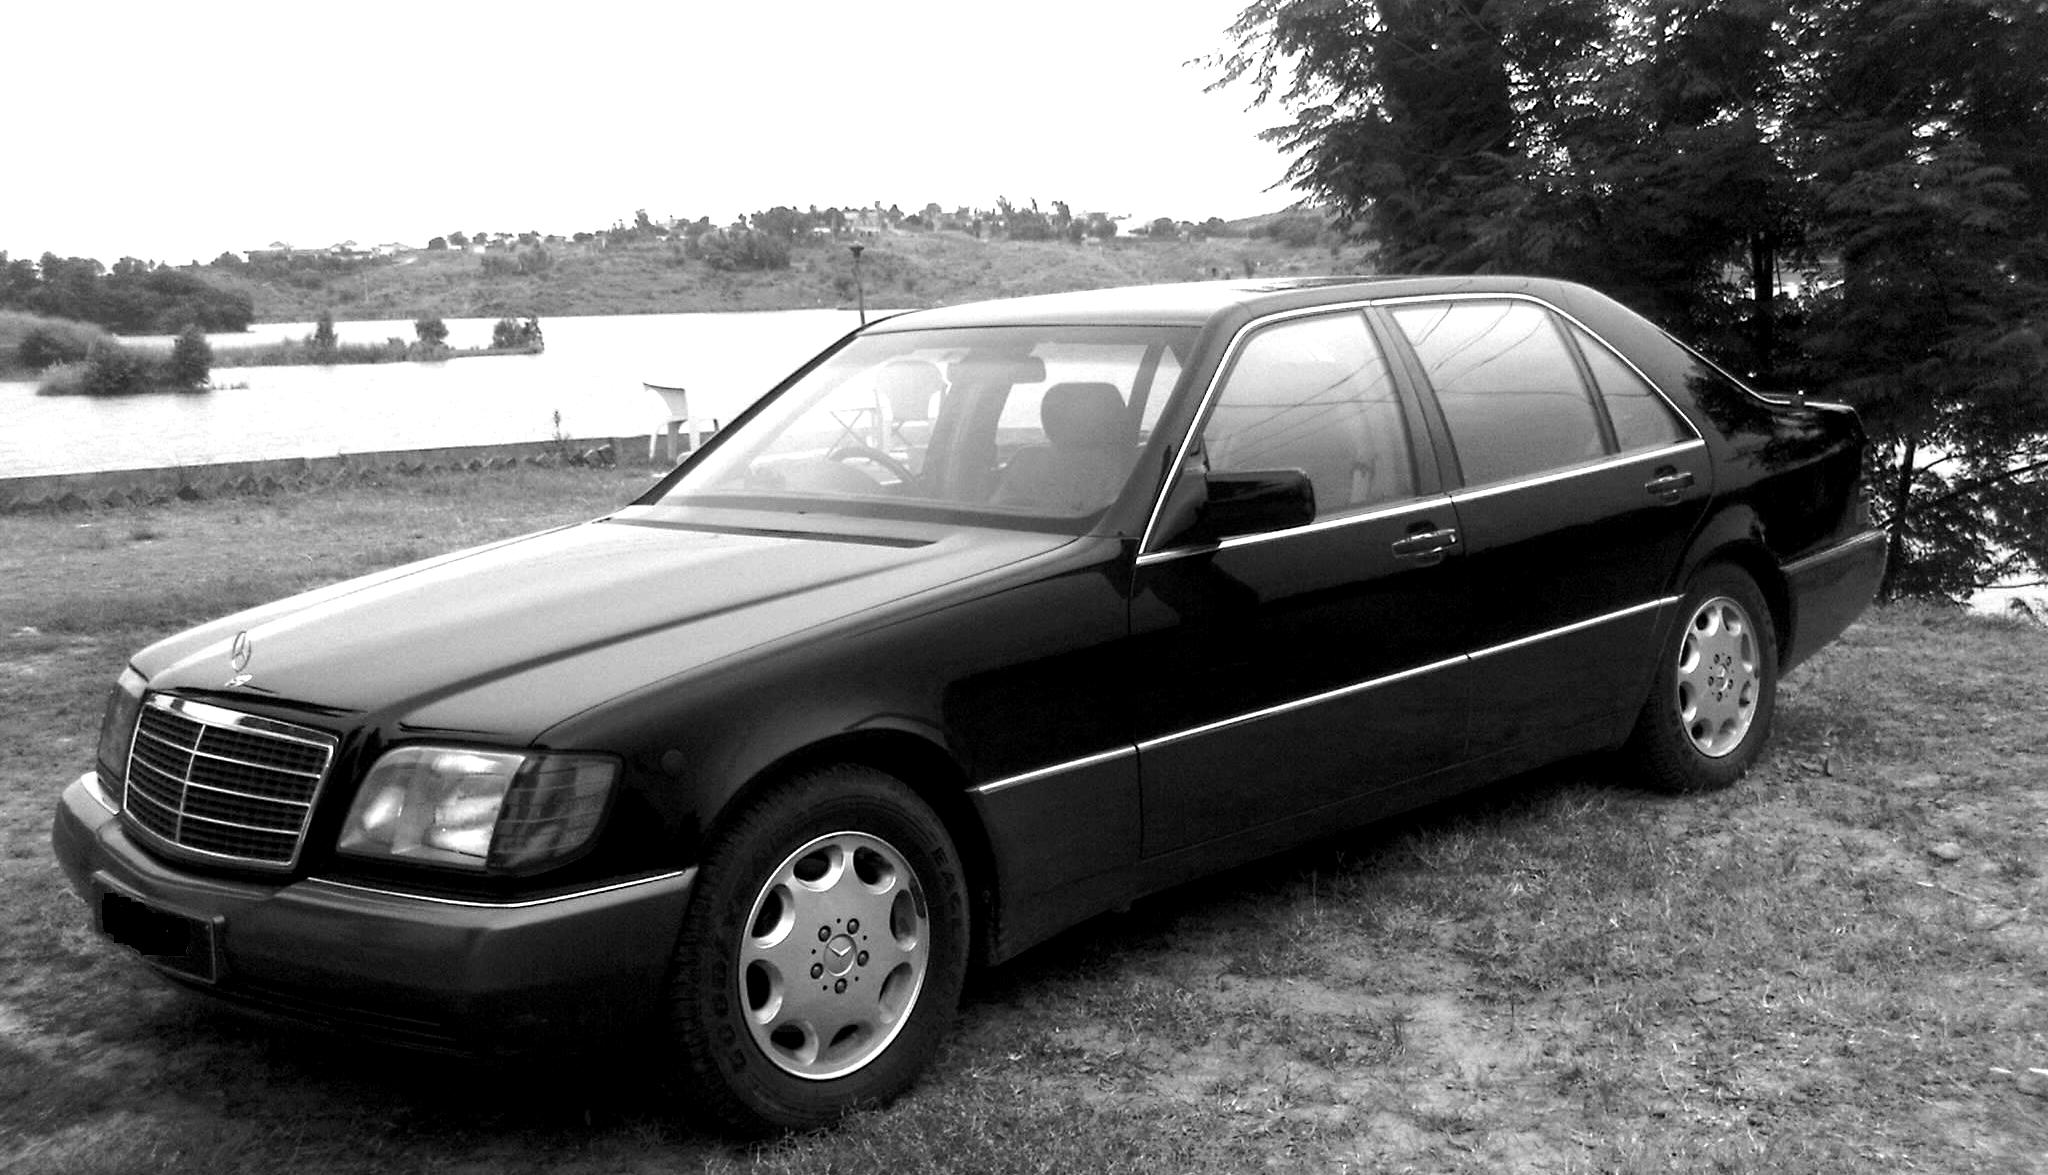 Mercedes Benz Other - 1993 blackbeauty Image-1